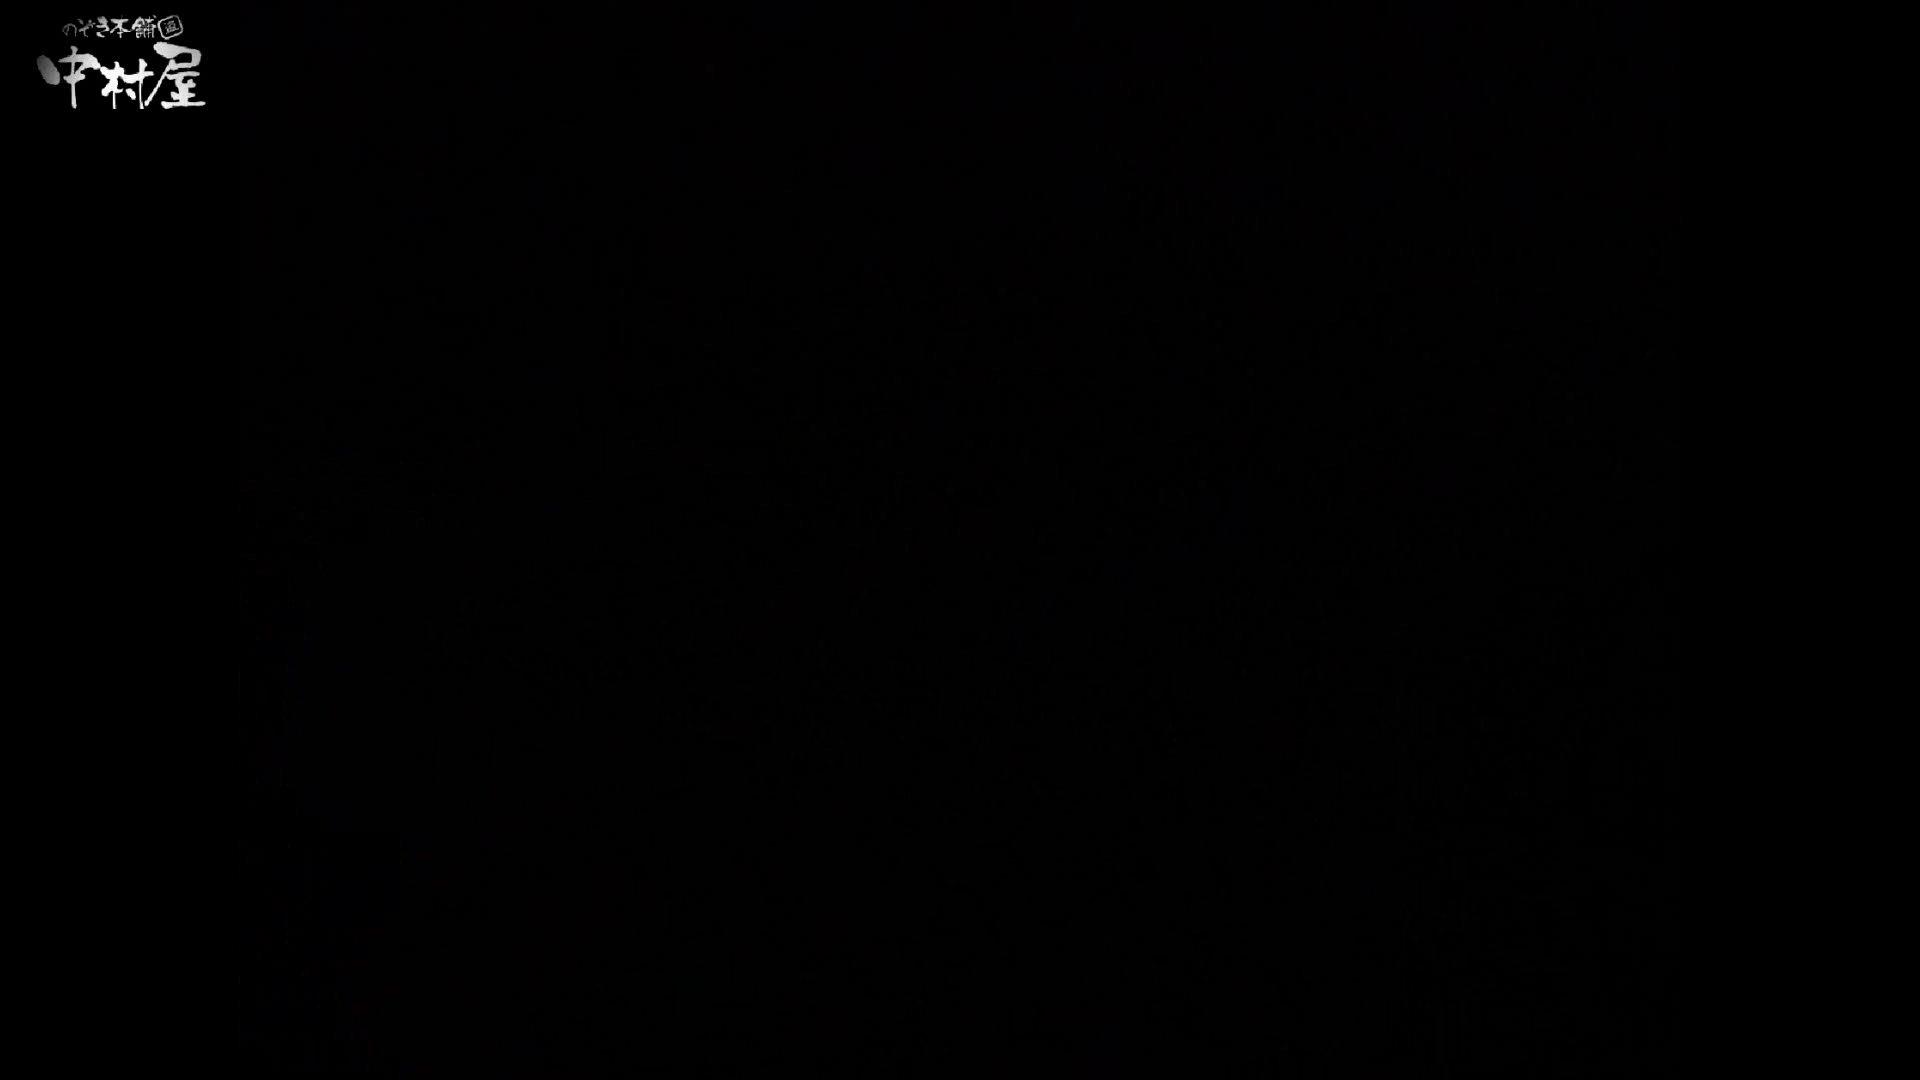 民家風呂専門盗撮師の超危険映像 vol.018 盗撮特撮 ワレメ動画紹介 10pic 3